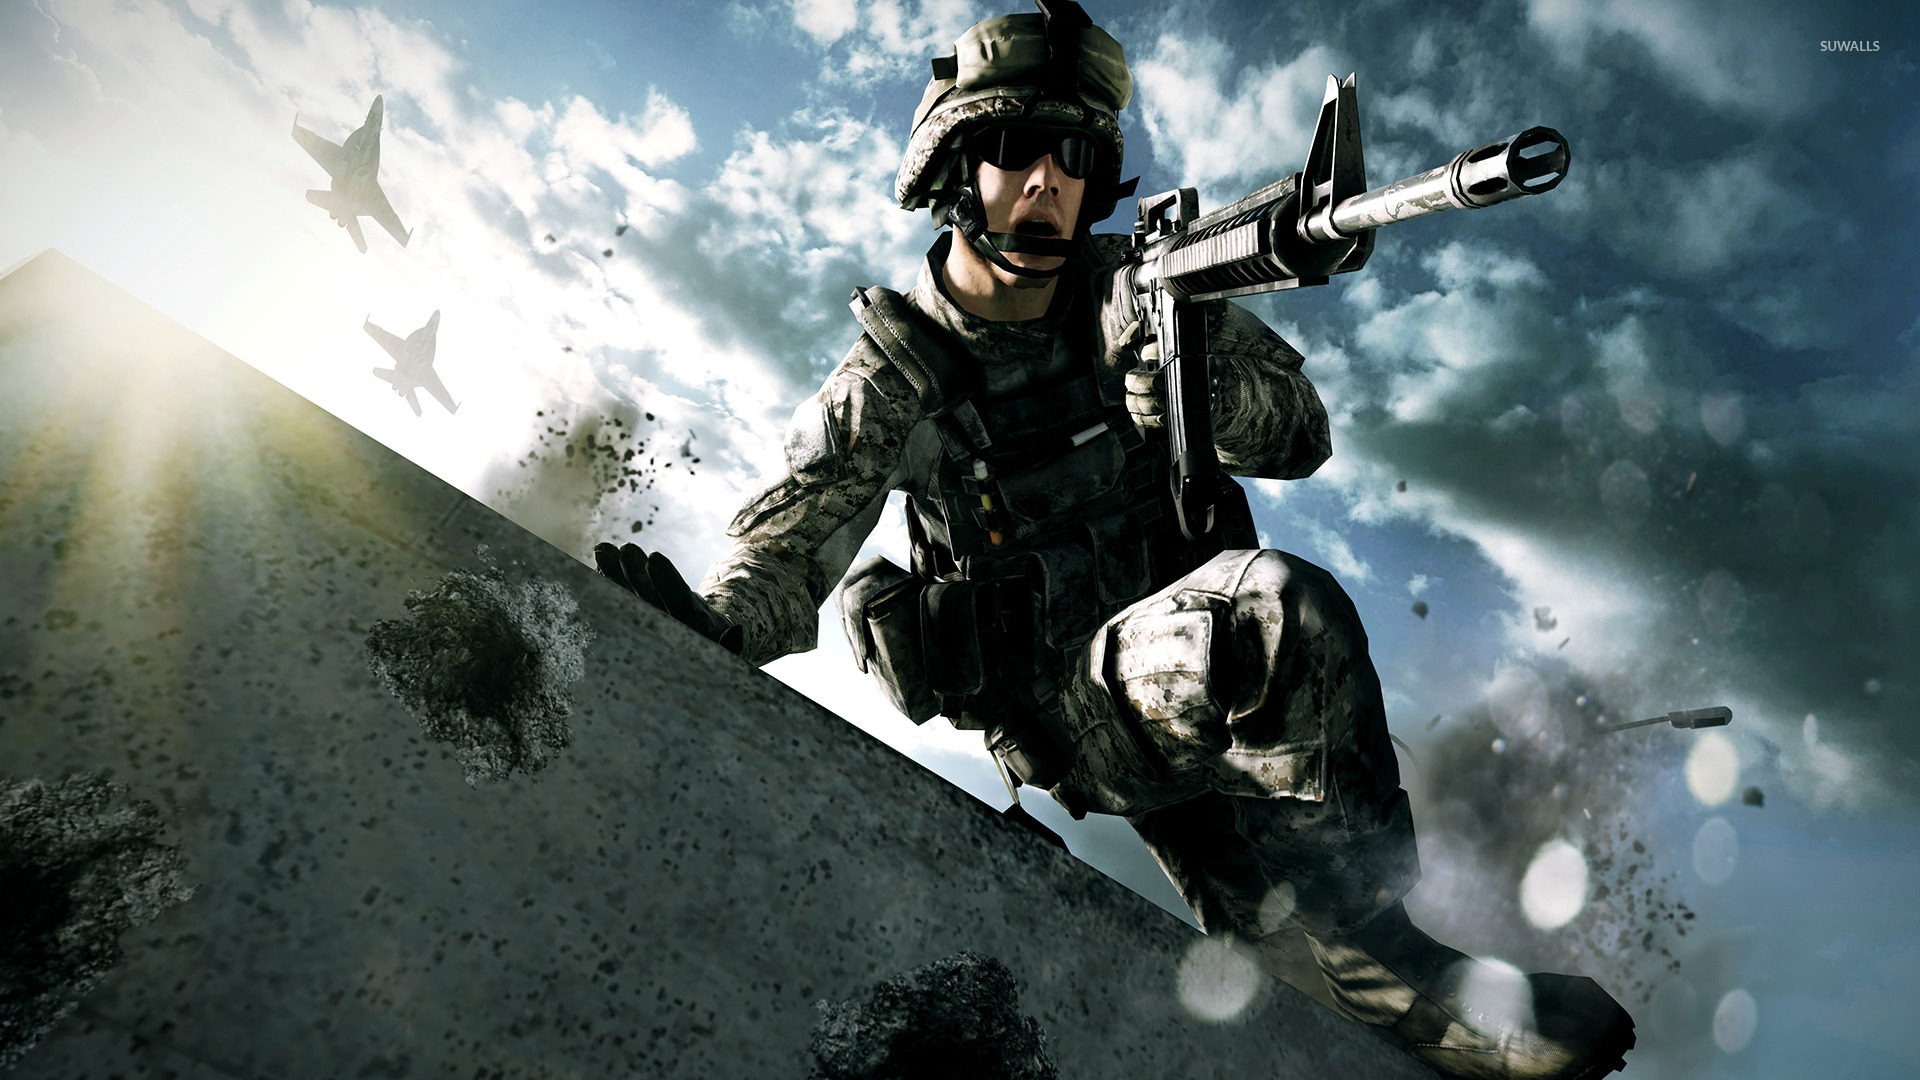 Battlefield 4 [2] wallpaper - Game wallpapers - #18713